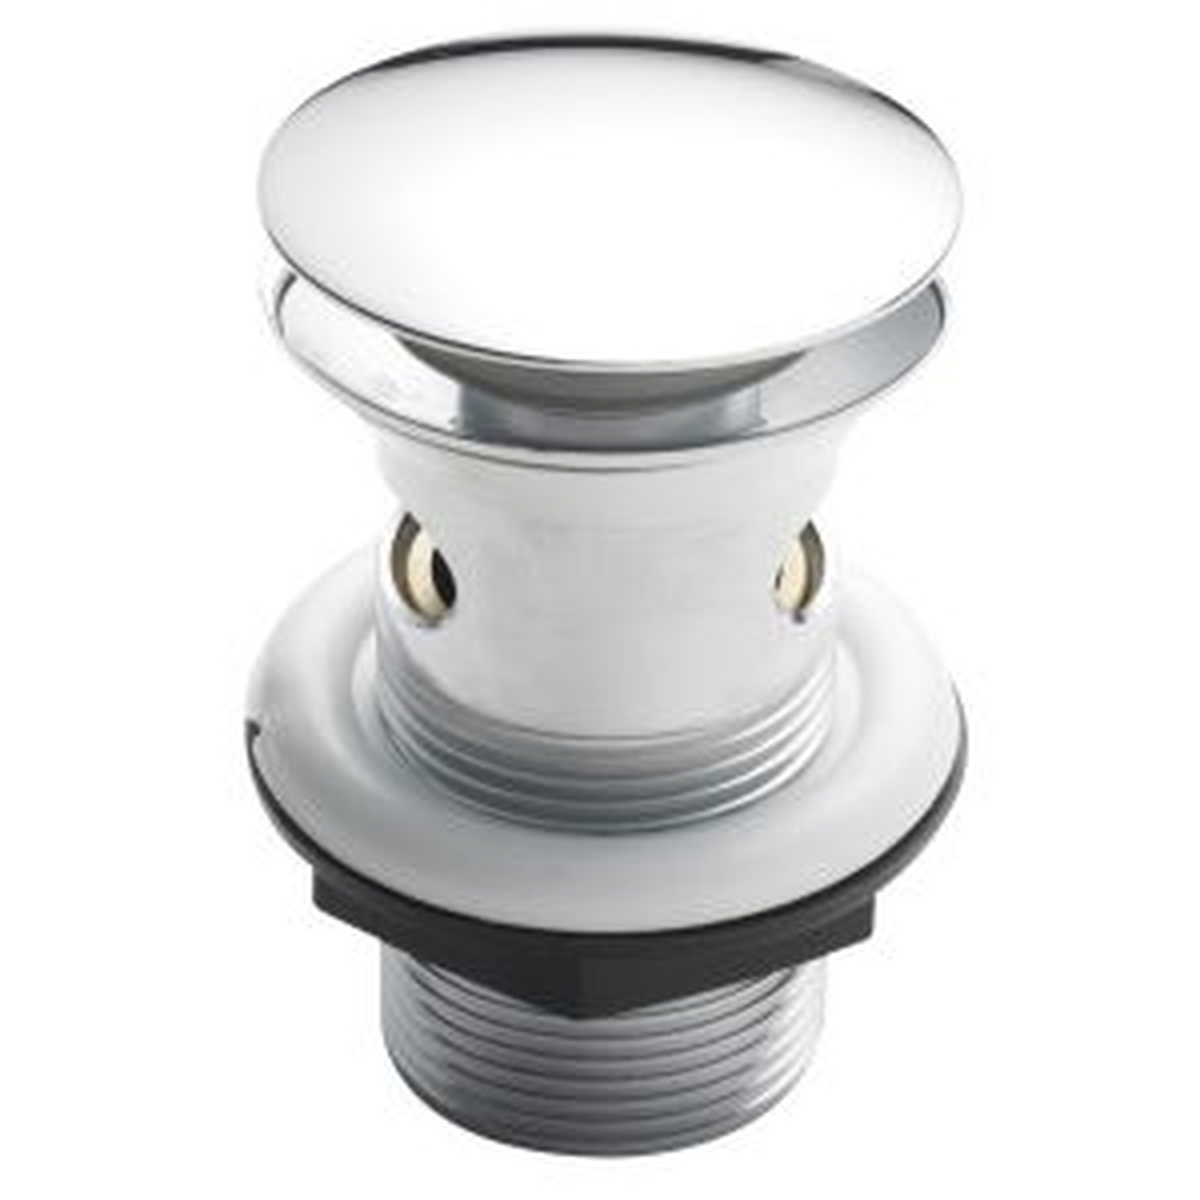 Ultra Easyclean Sprung Plug Basin Waste